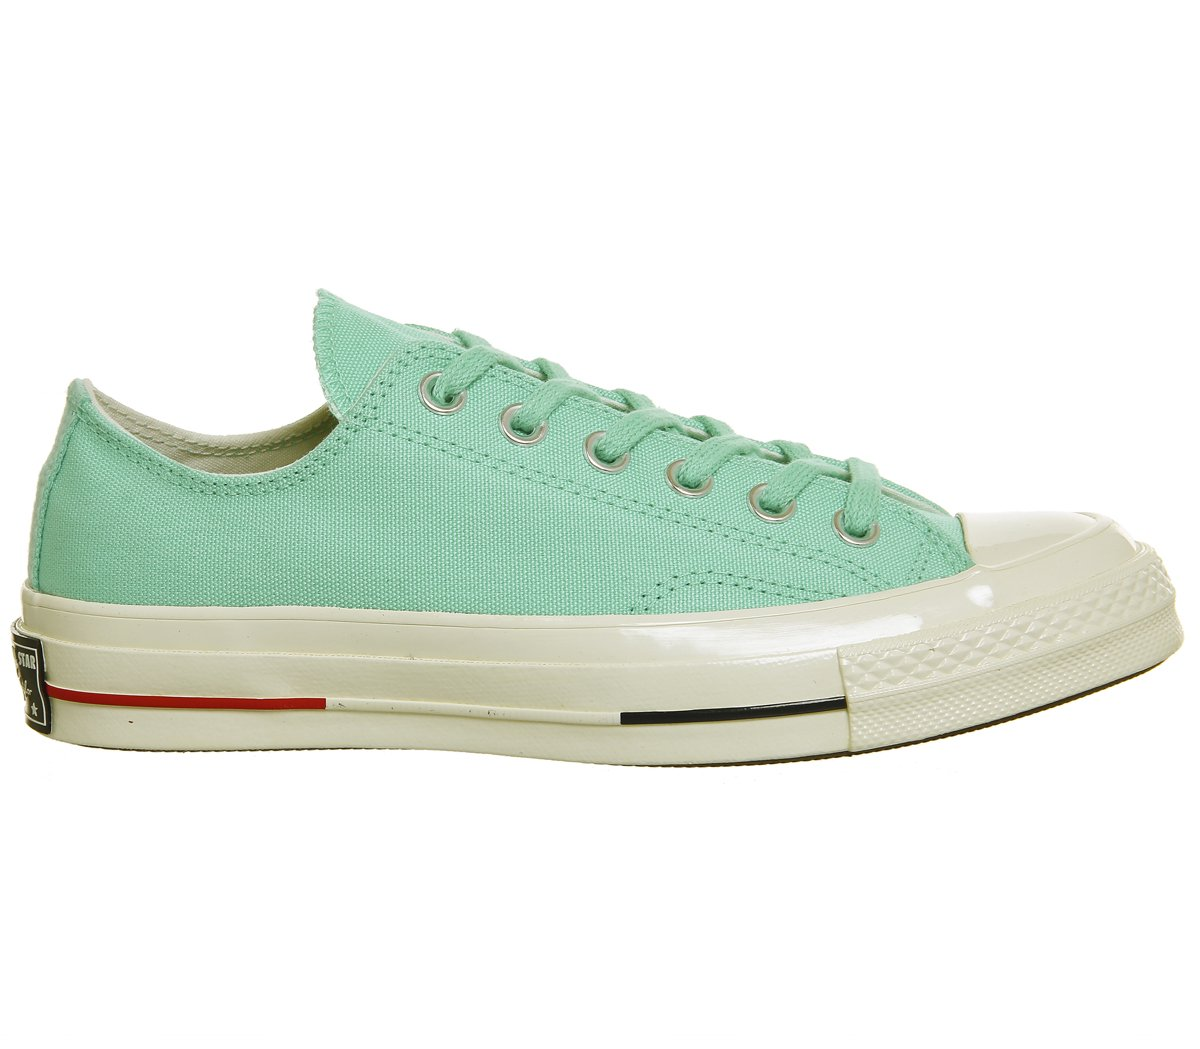 Converse AS Hi Can charcoal 1J793 Unisex-Erwachsene Sneaker  40 EU|Light Menta Navy Gym Red